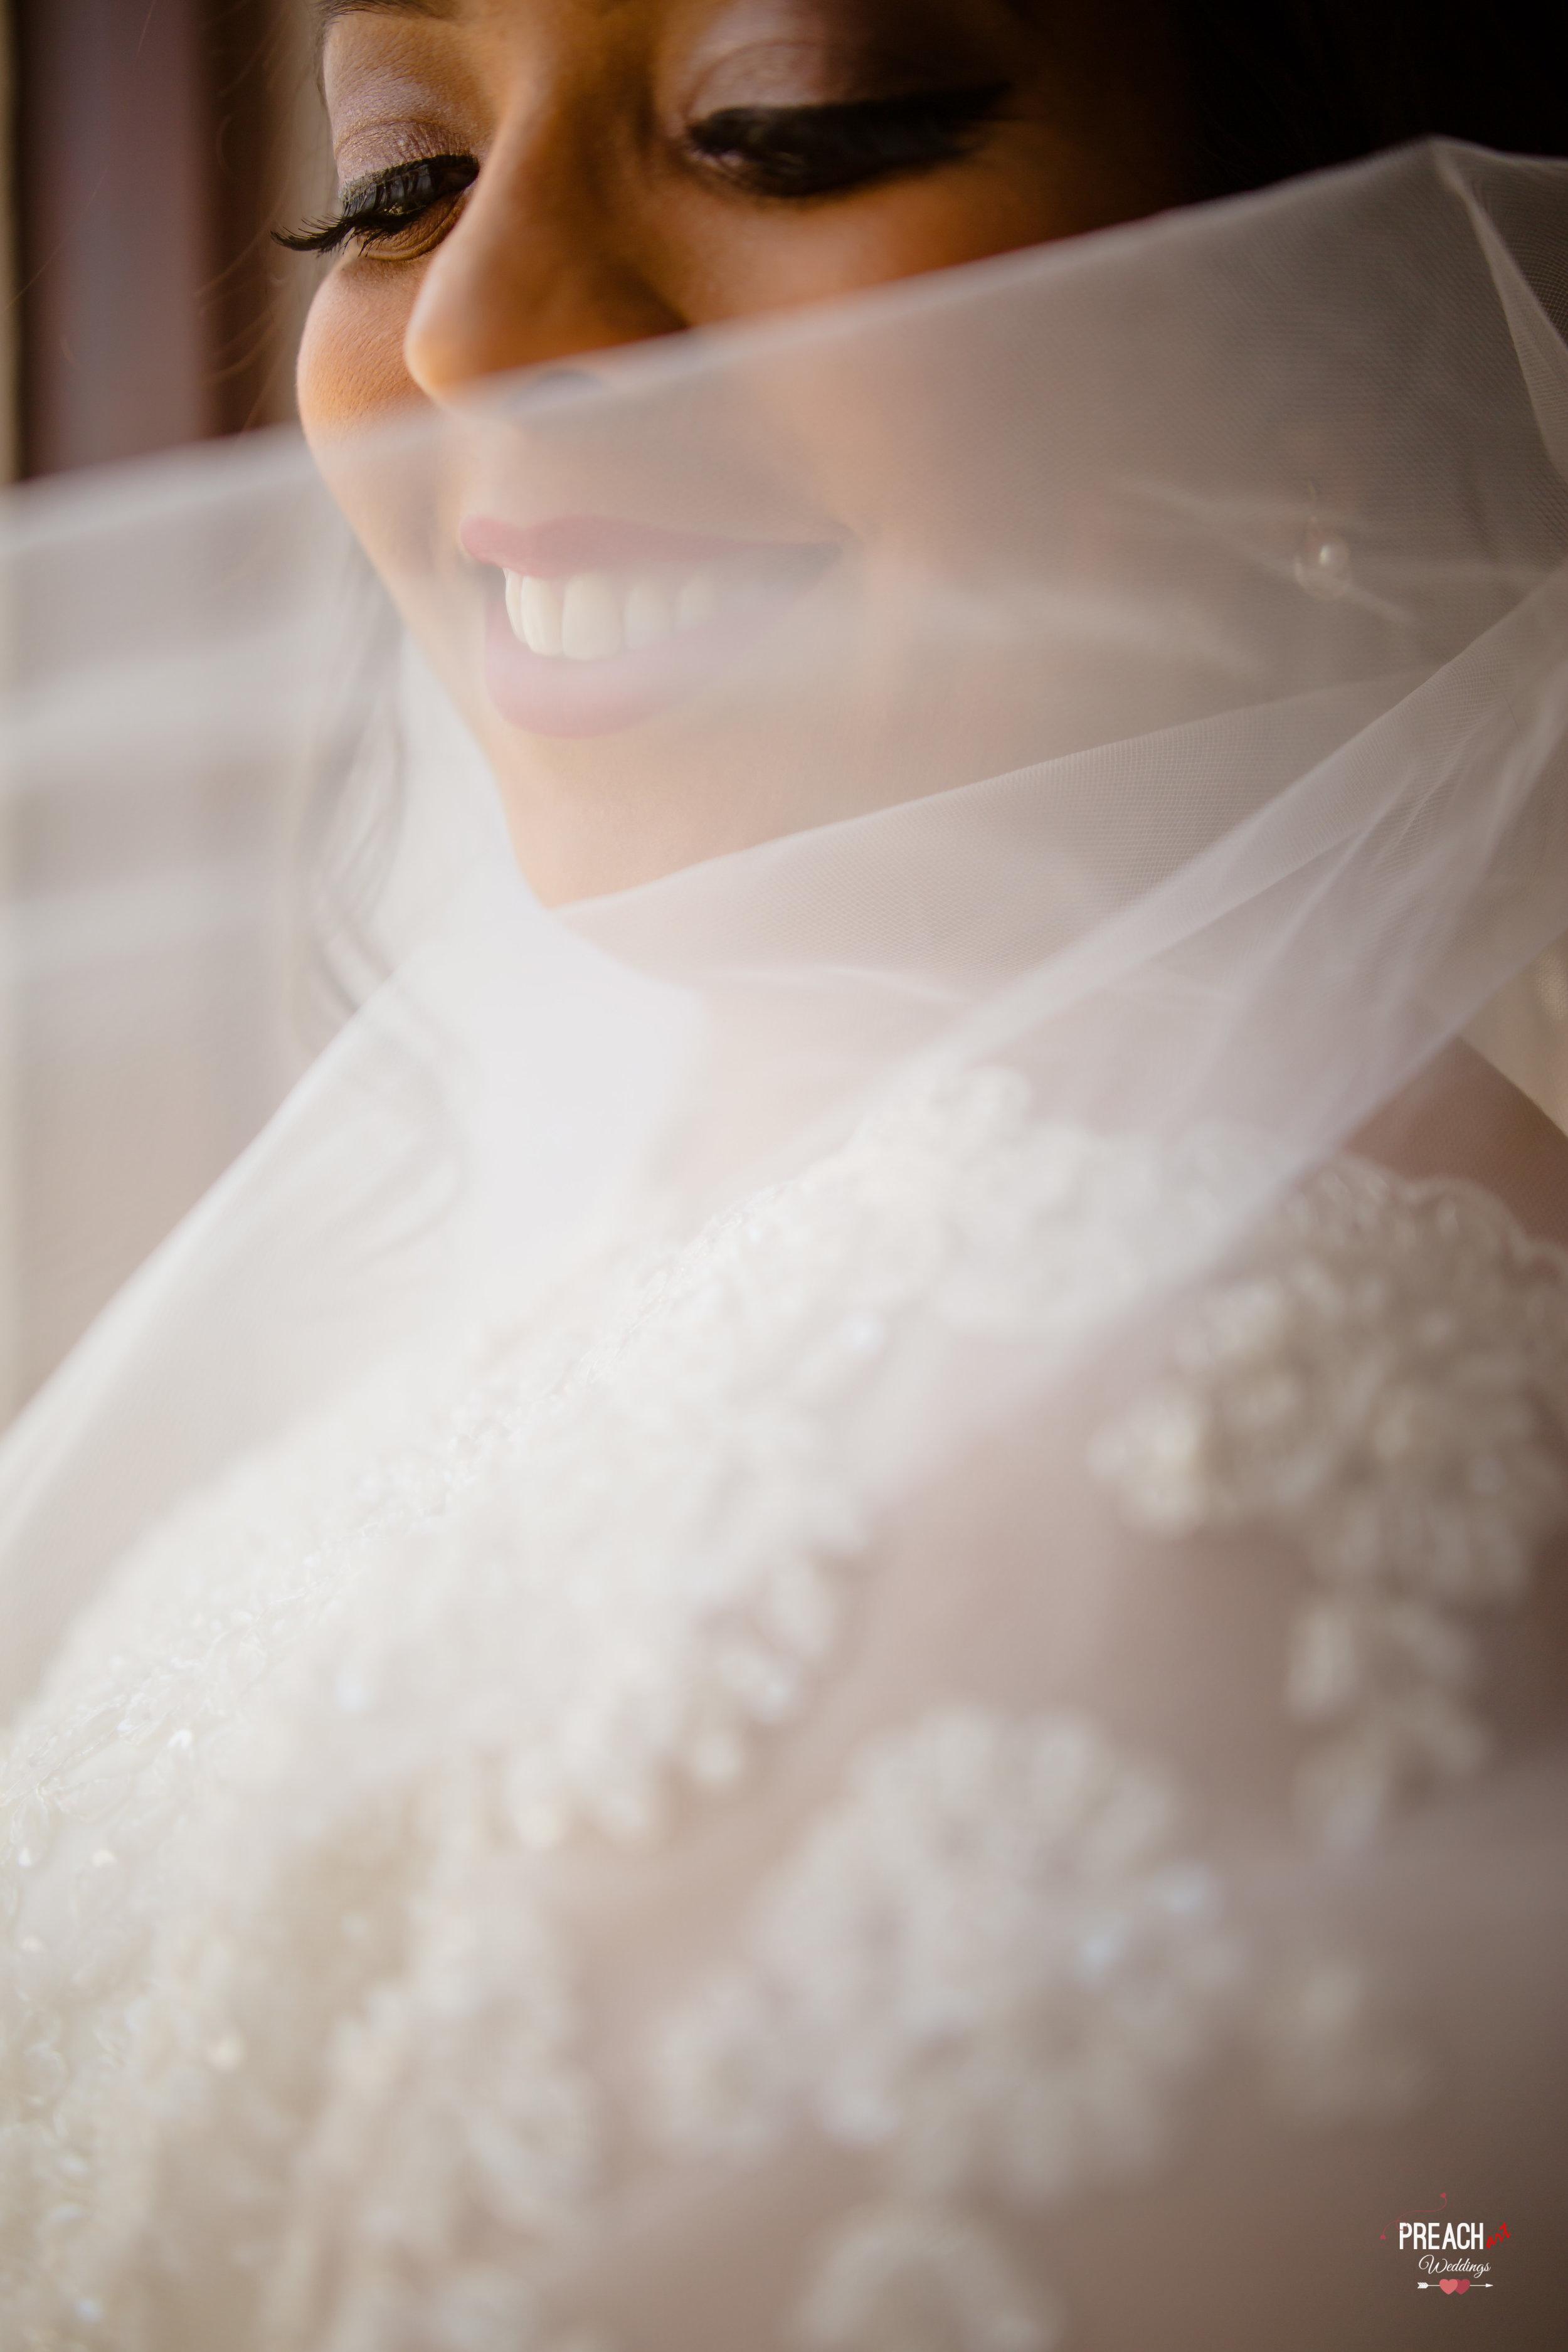 DEBORAH & MORRENO WEDDING, GOA